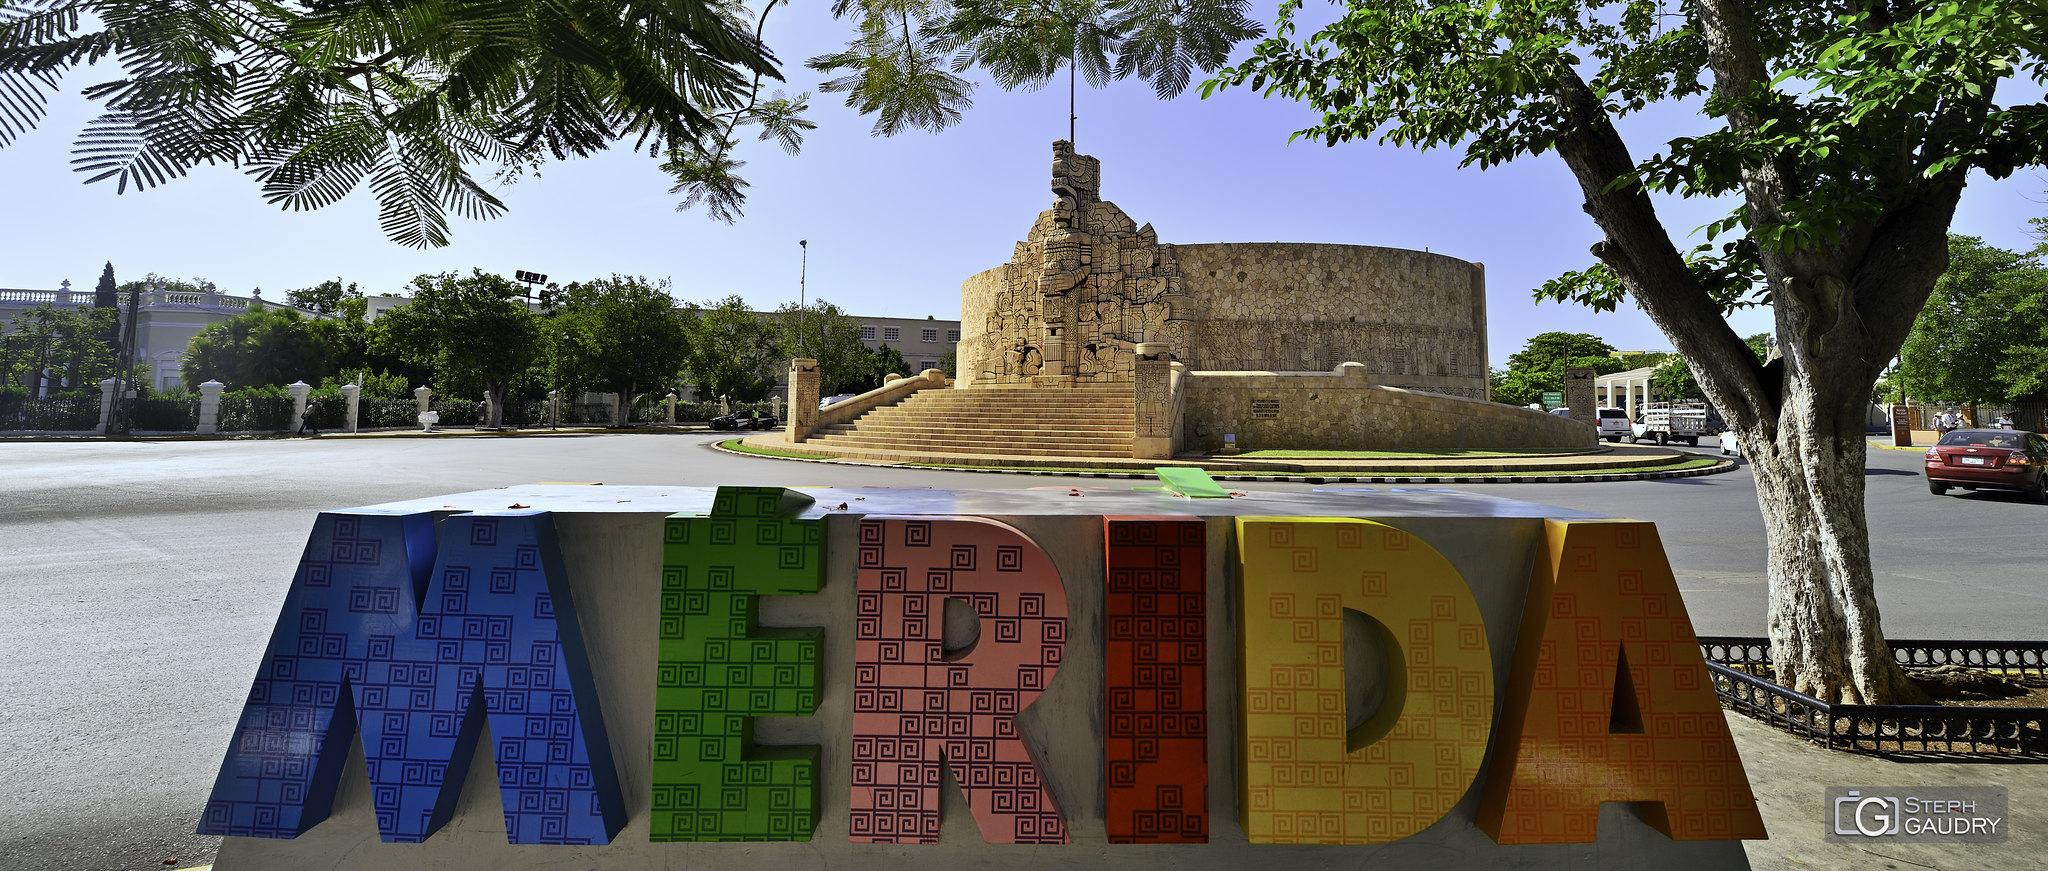 Merida - monument [Cliquez pour lancer le diaporama]